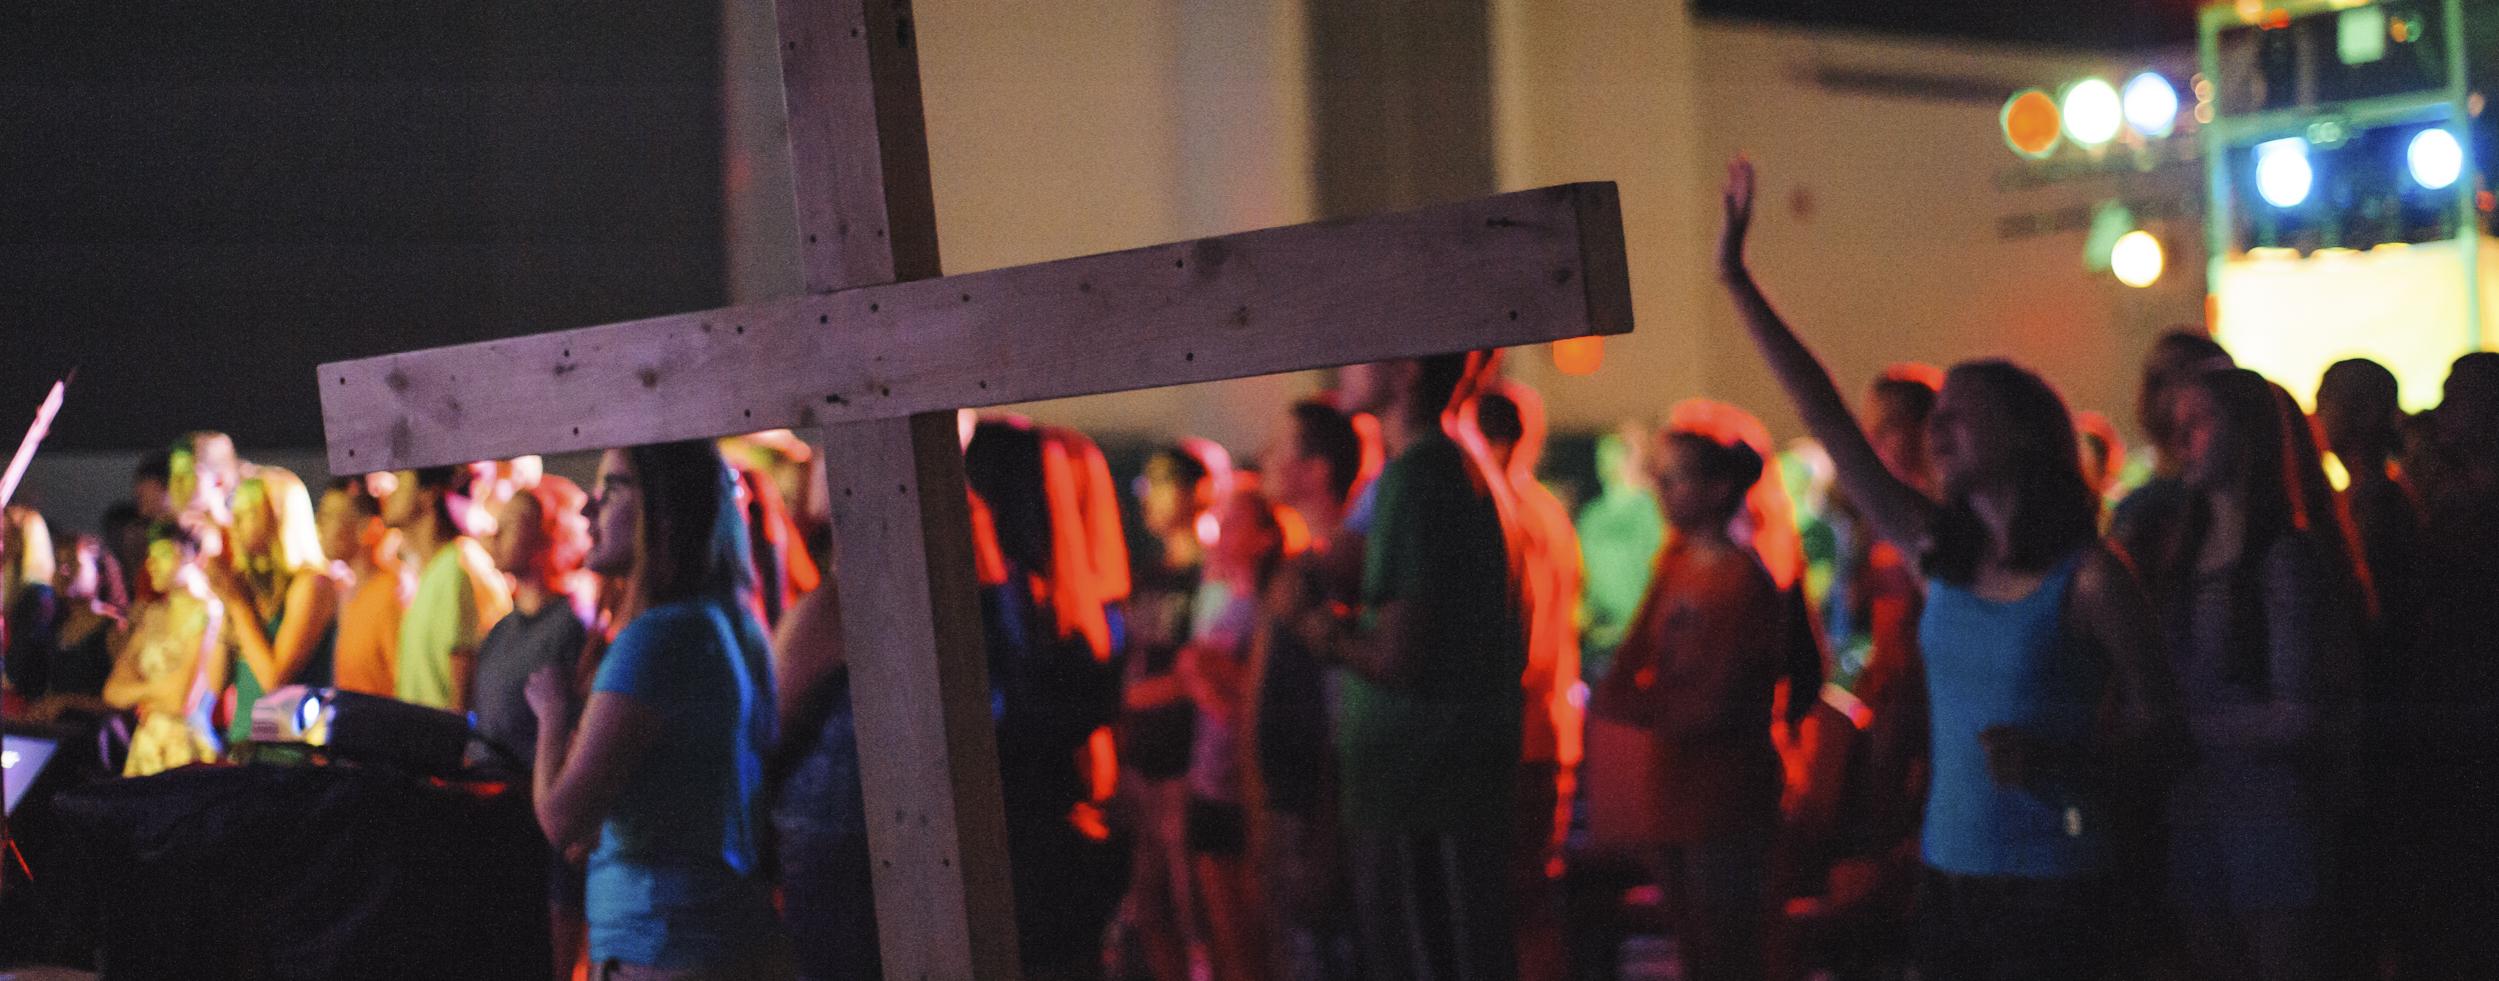 worship-5.jpg